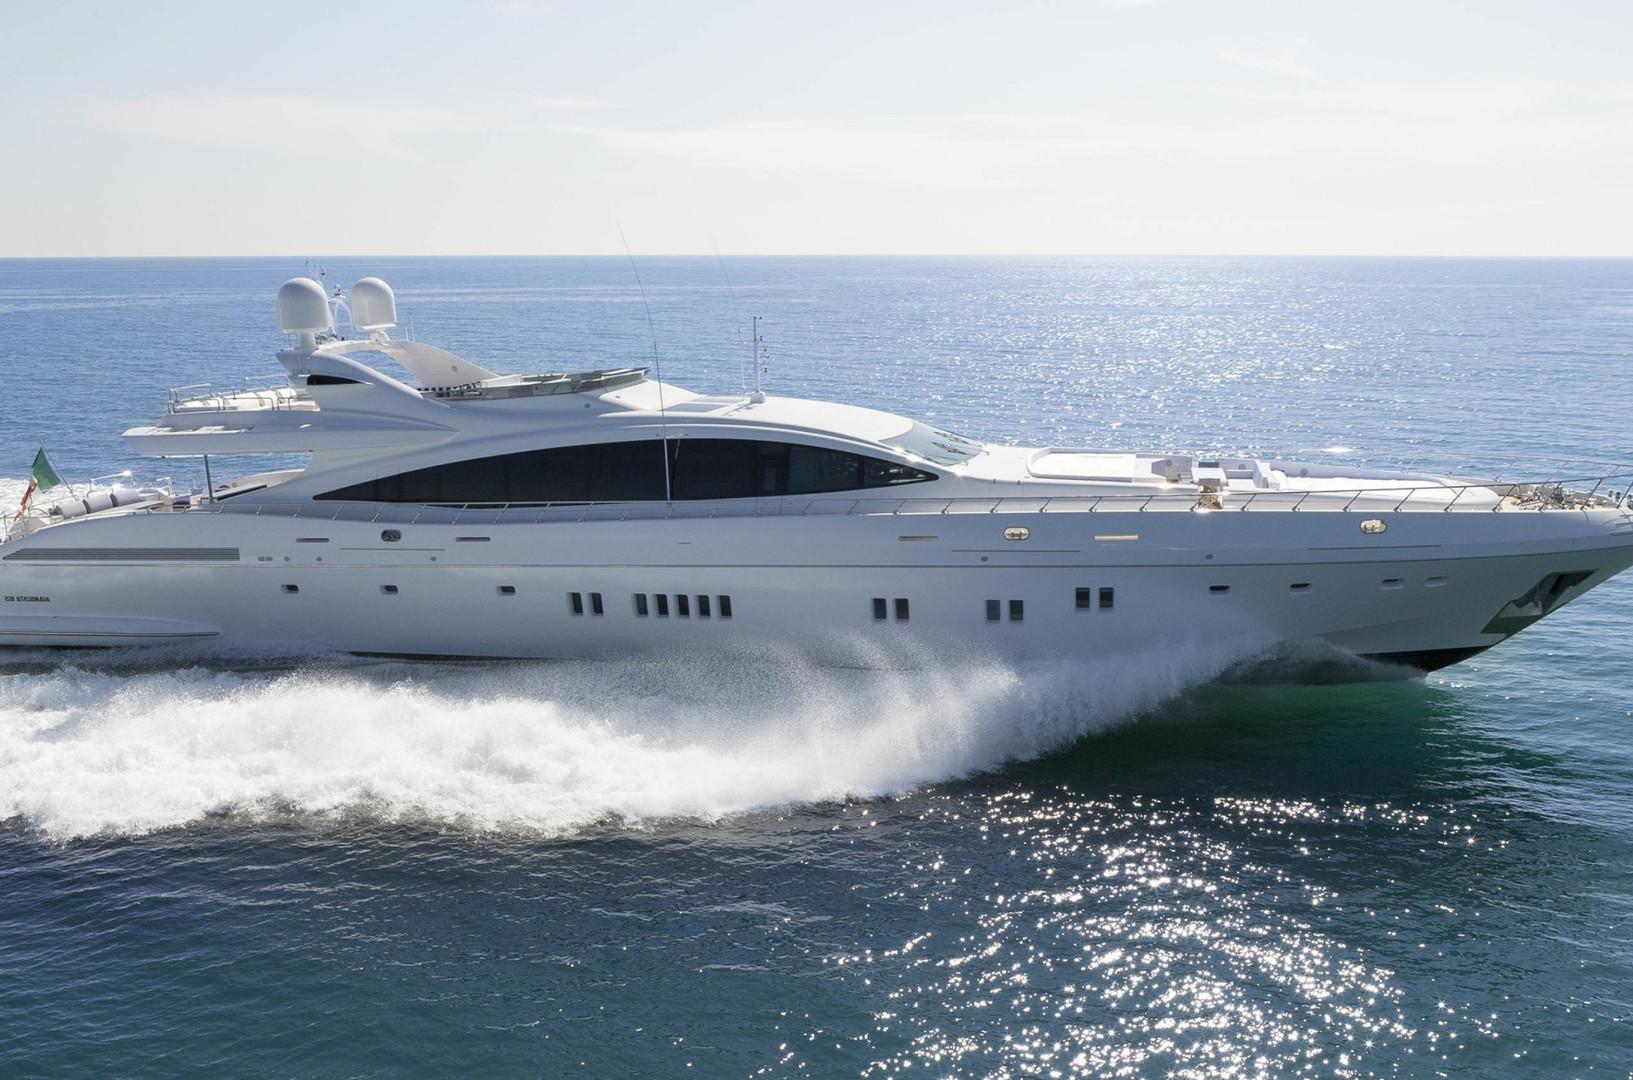 Yacht DA VINCI - 50m Mangusta on charter from Monaco, heading down to St. Tropez